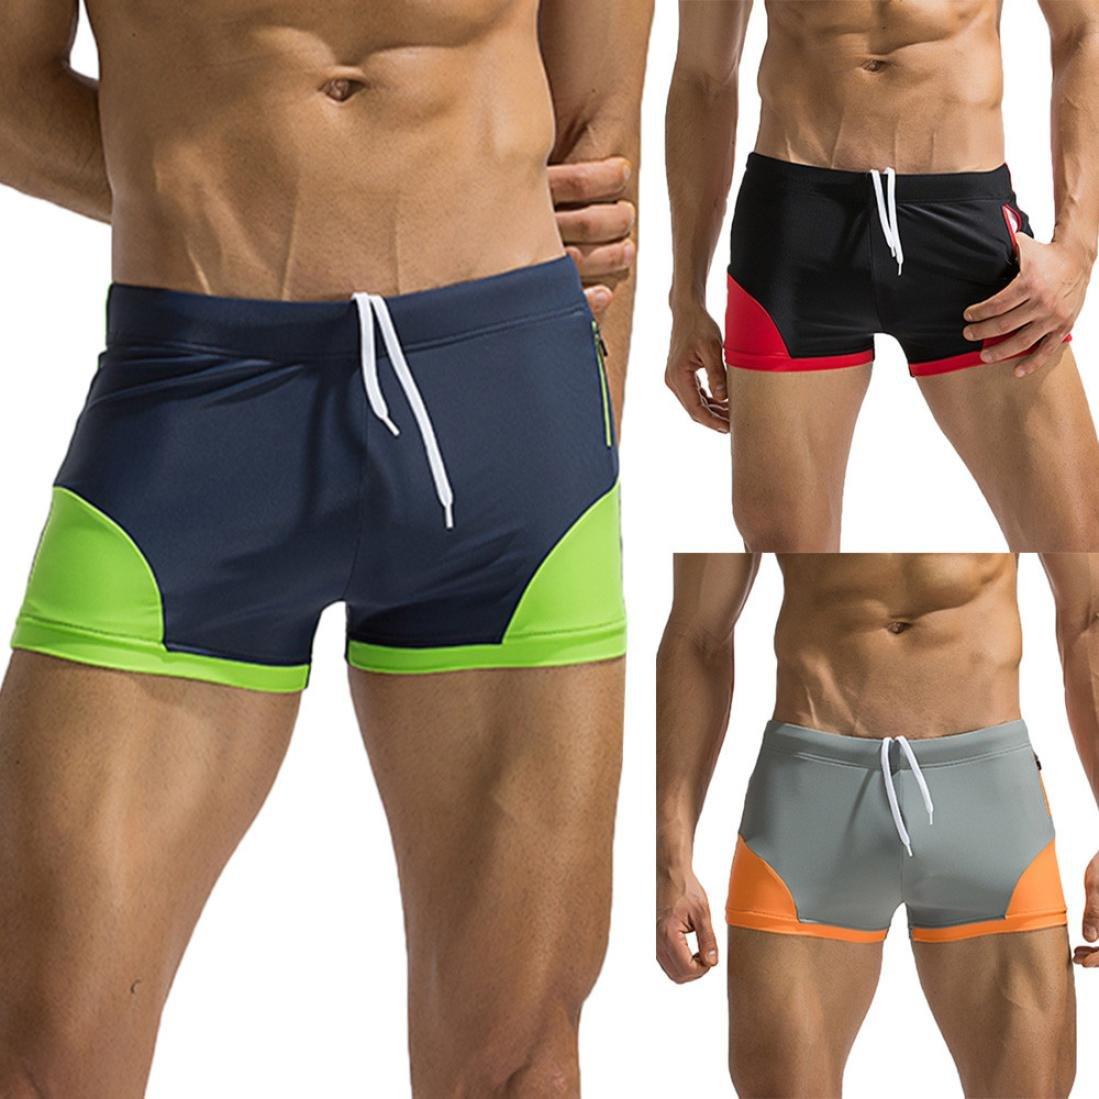 vermers Hot Sale Men's Casual Swimwear Boardshorts - 2018 New Beach Shorts Surfing Splice Swim Boxer Trunks(L, Black)